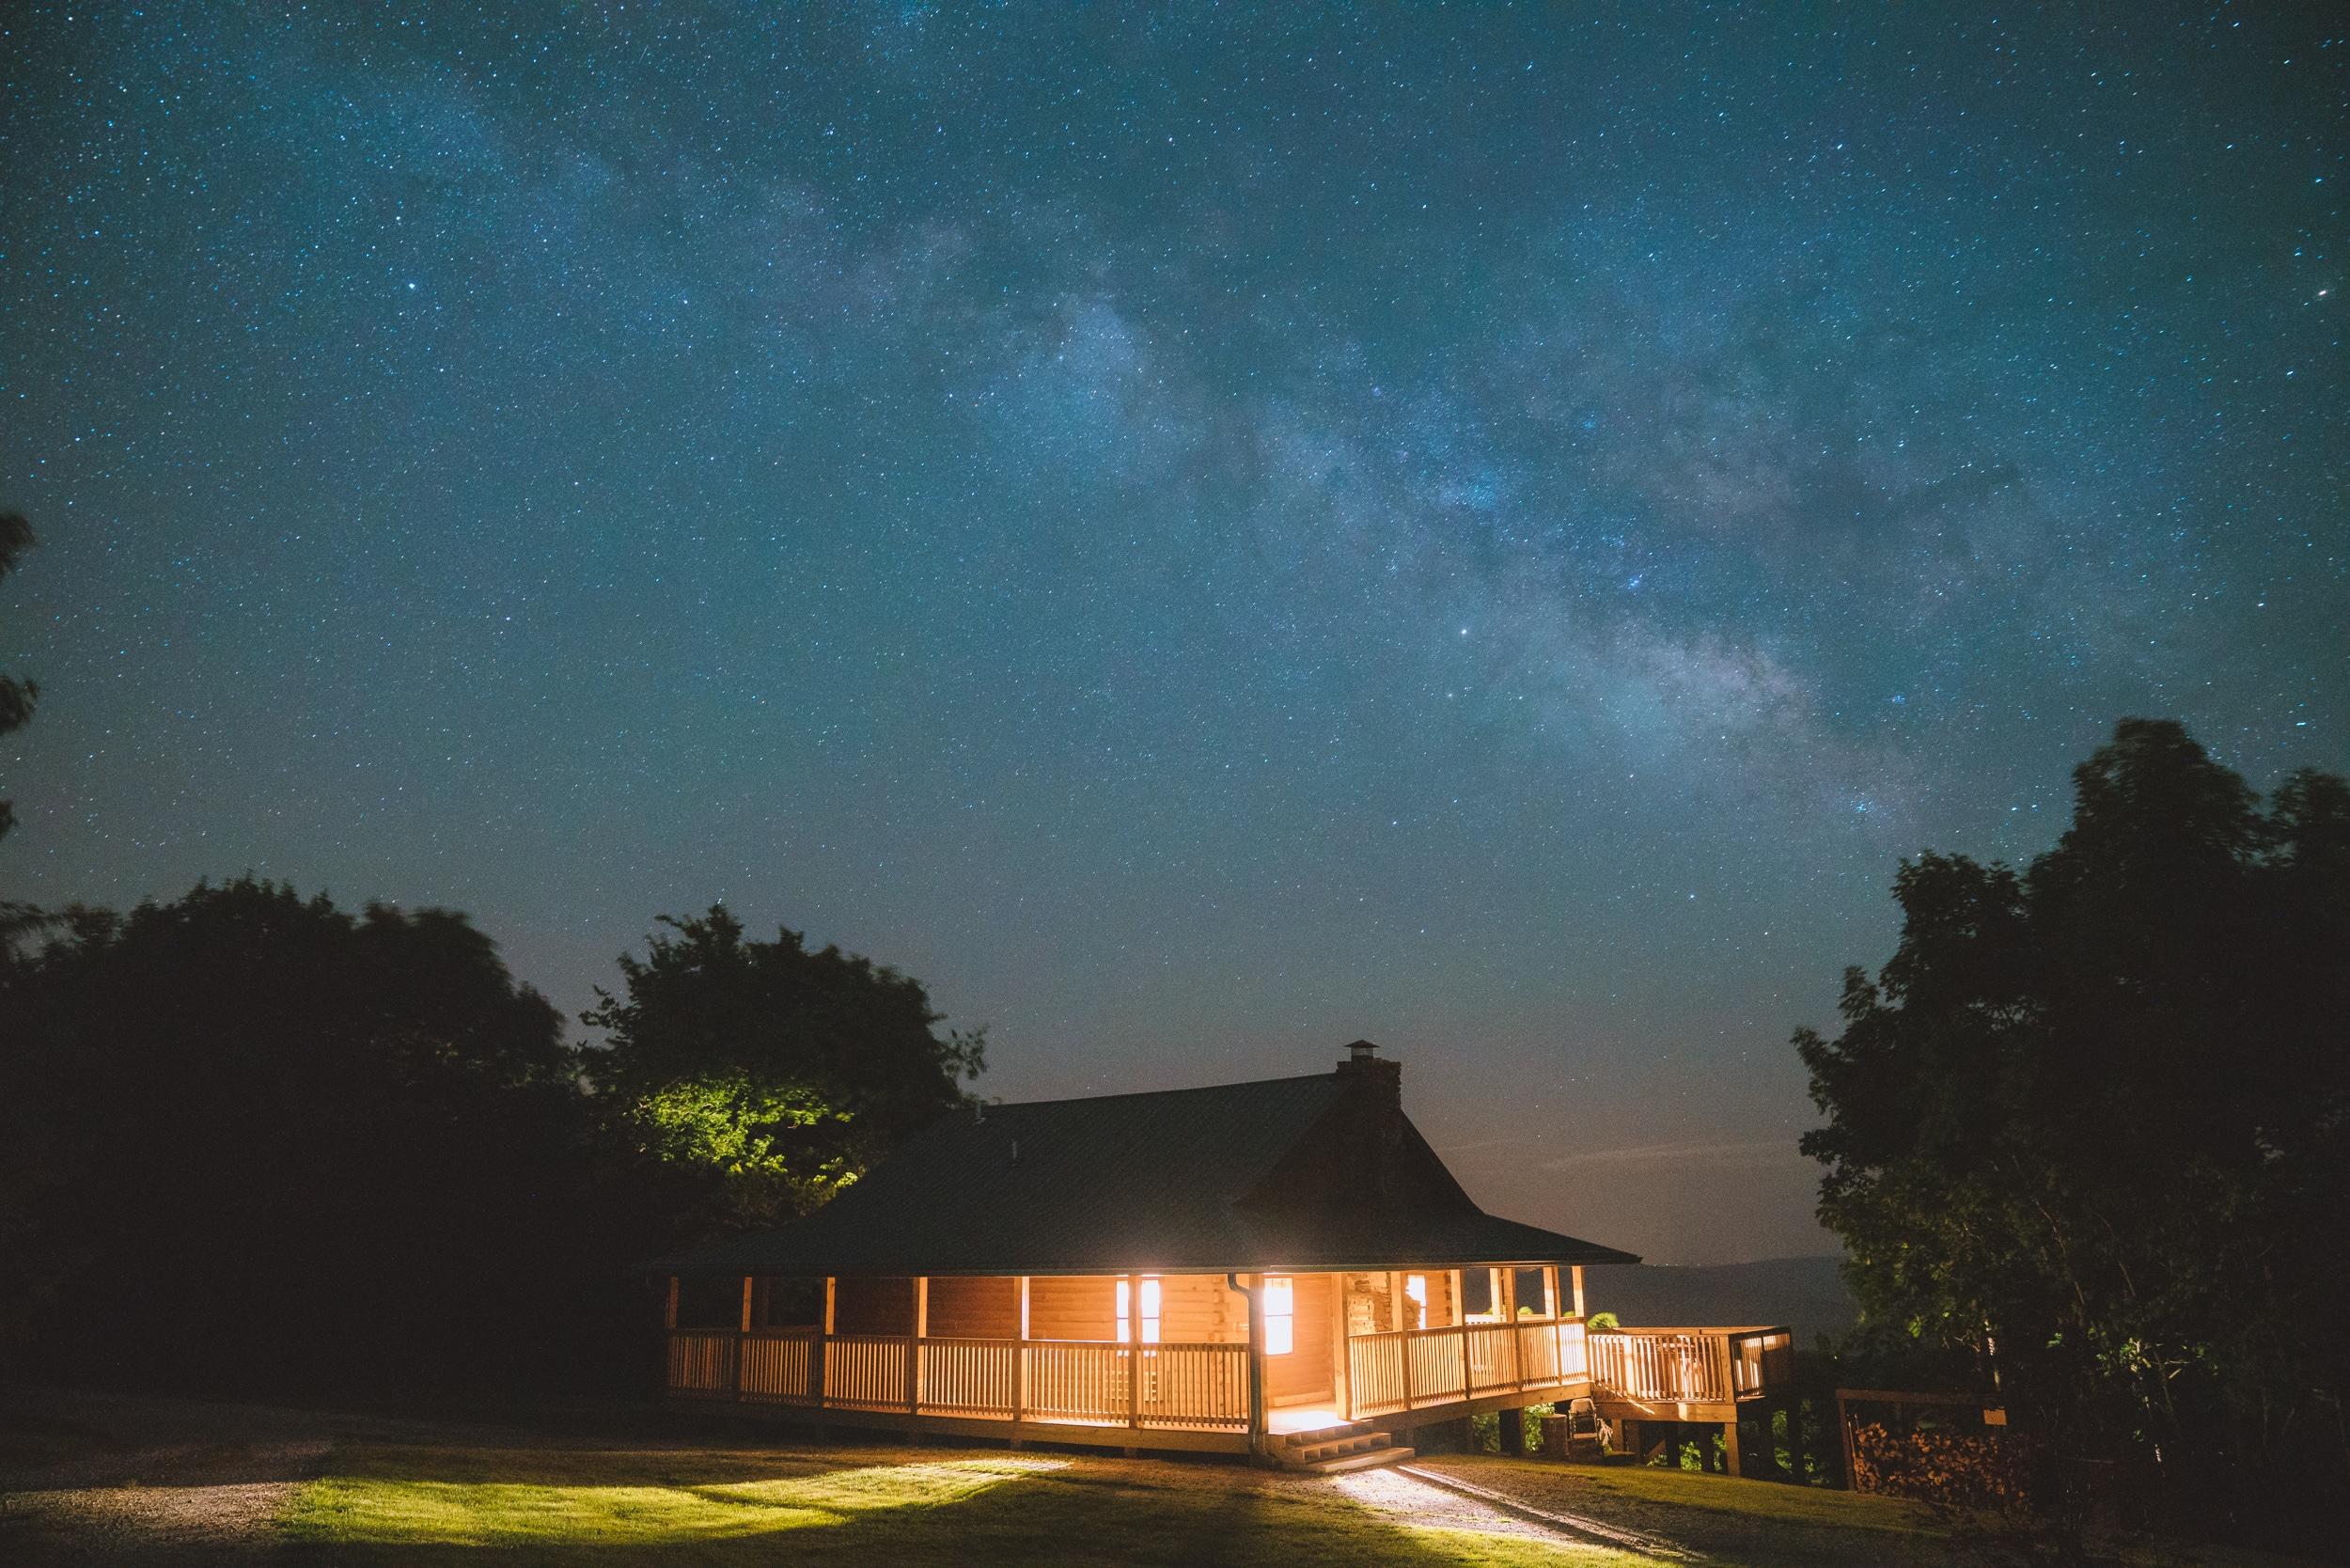 Milky way at dark sky resort